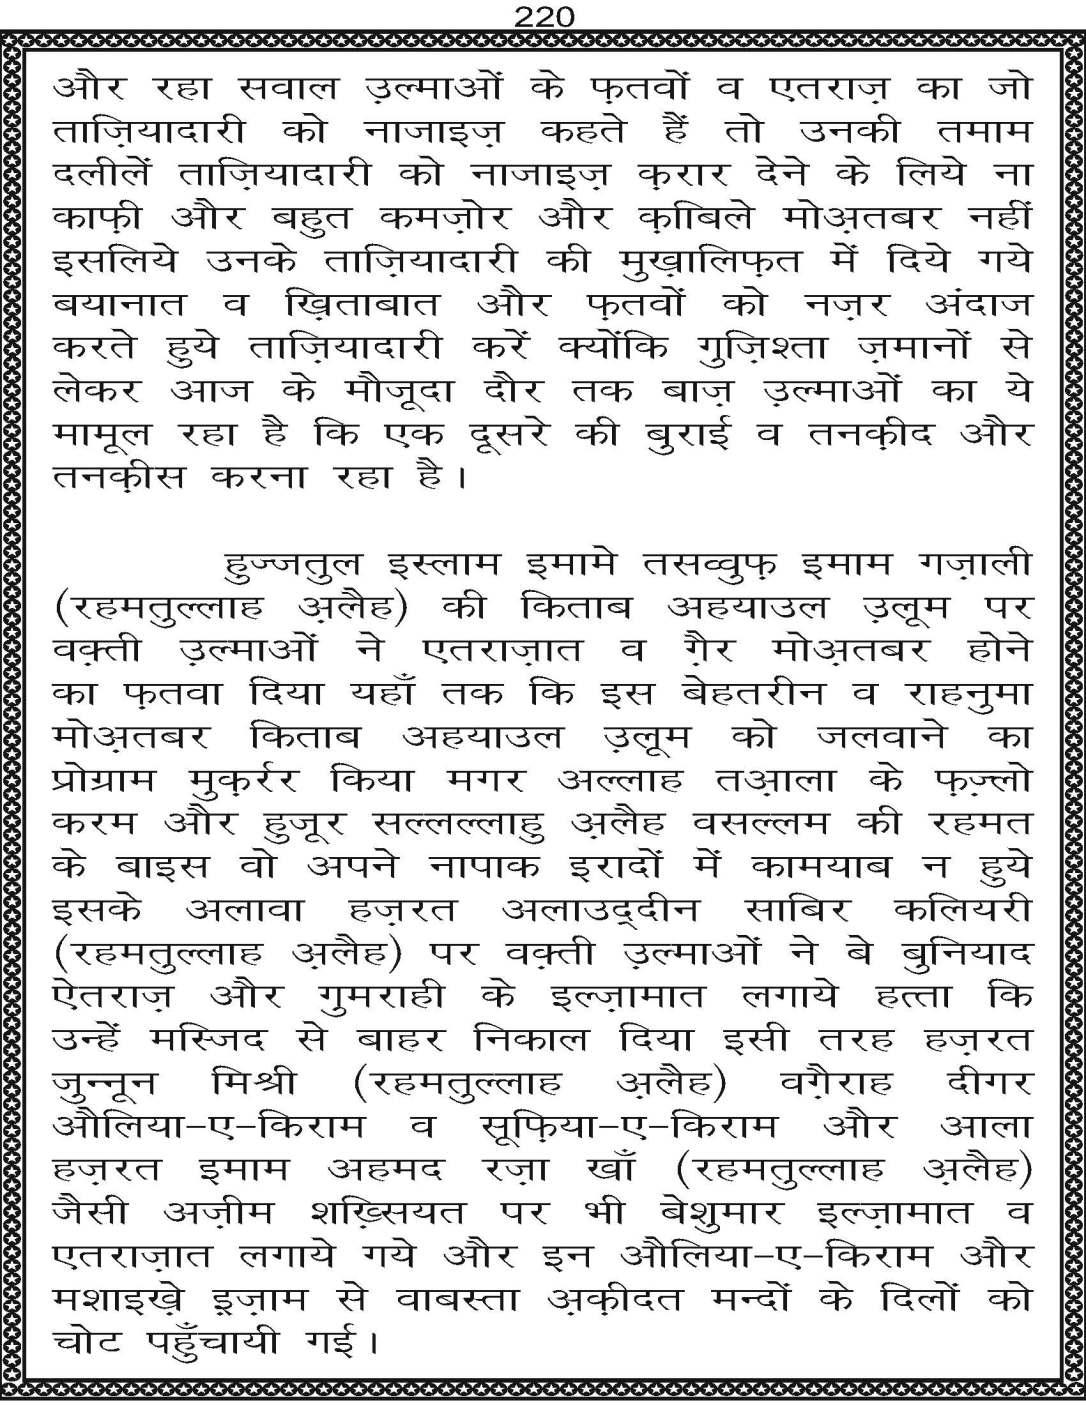 AzmateTaziyadari_Page_220